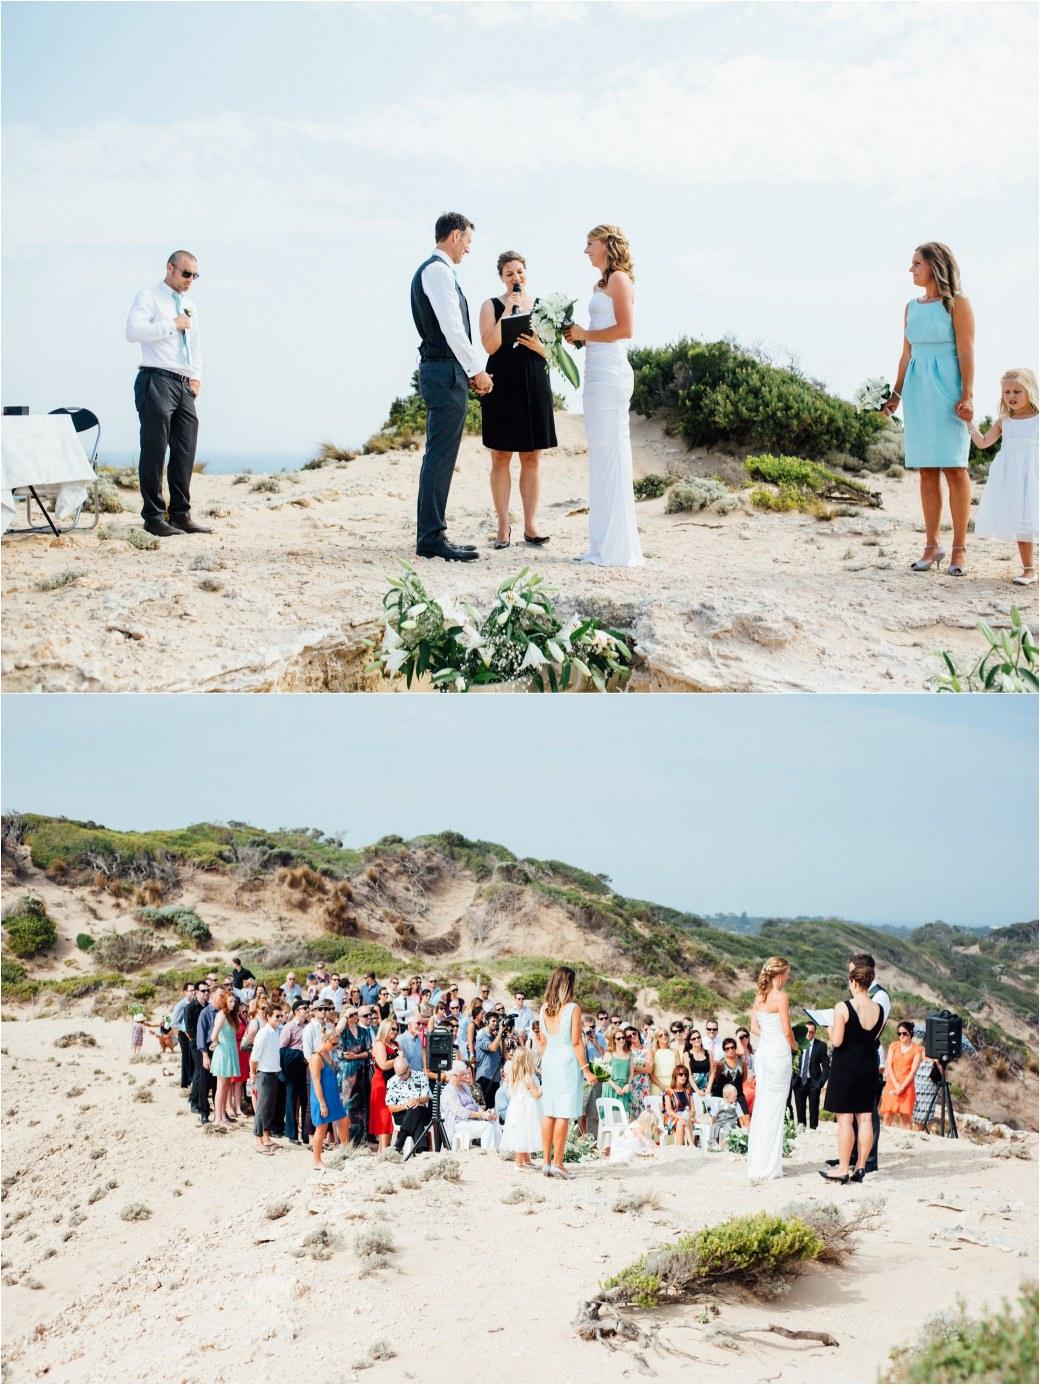 hanwin triathlon taco truck sorrento australian beach witsup wedding day melbourne wedding hyggelig photography038